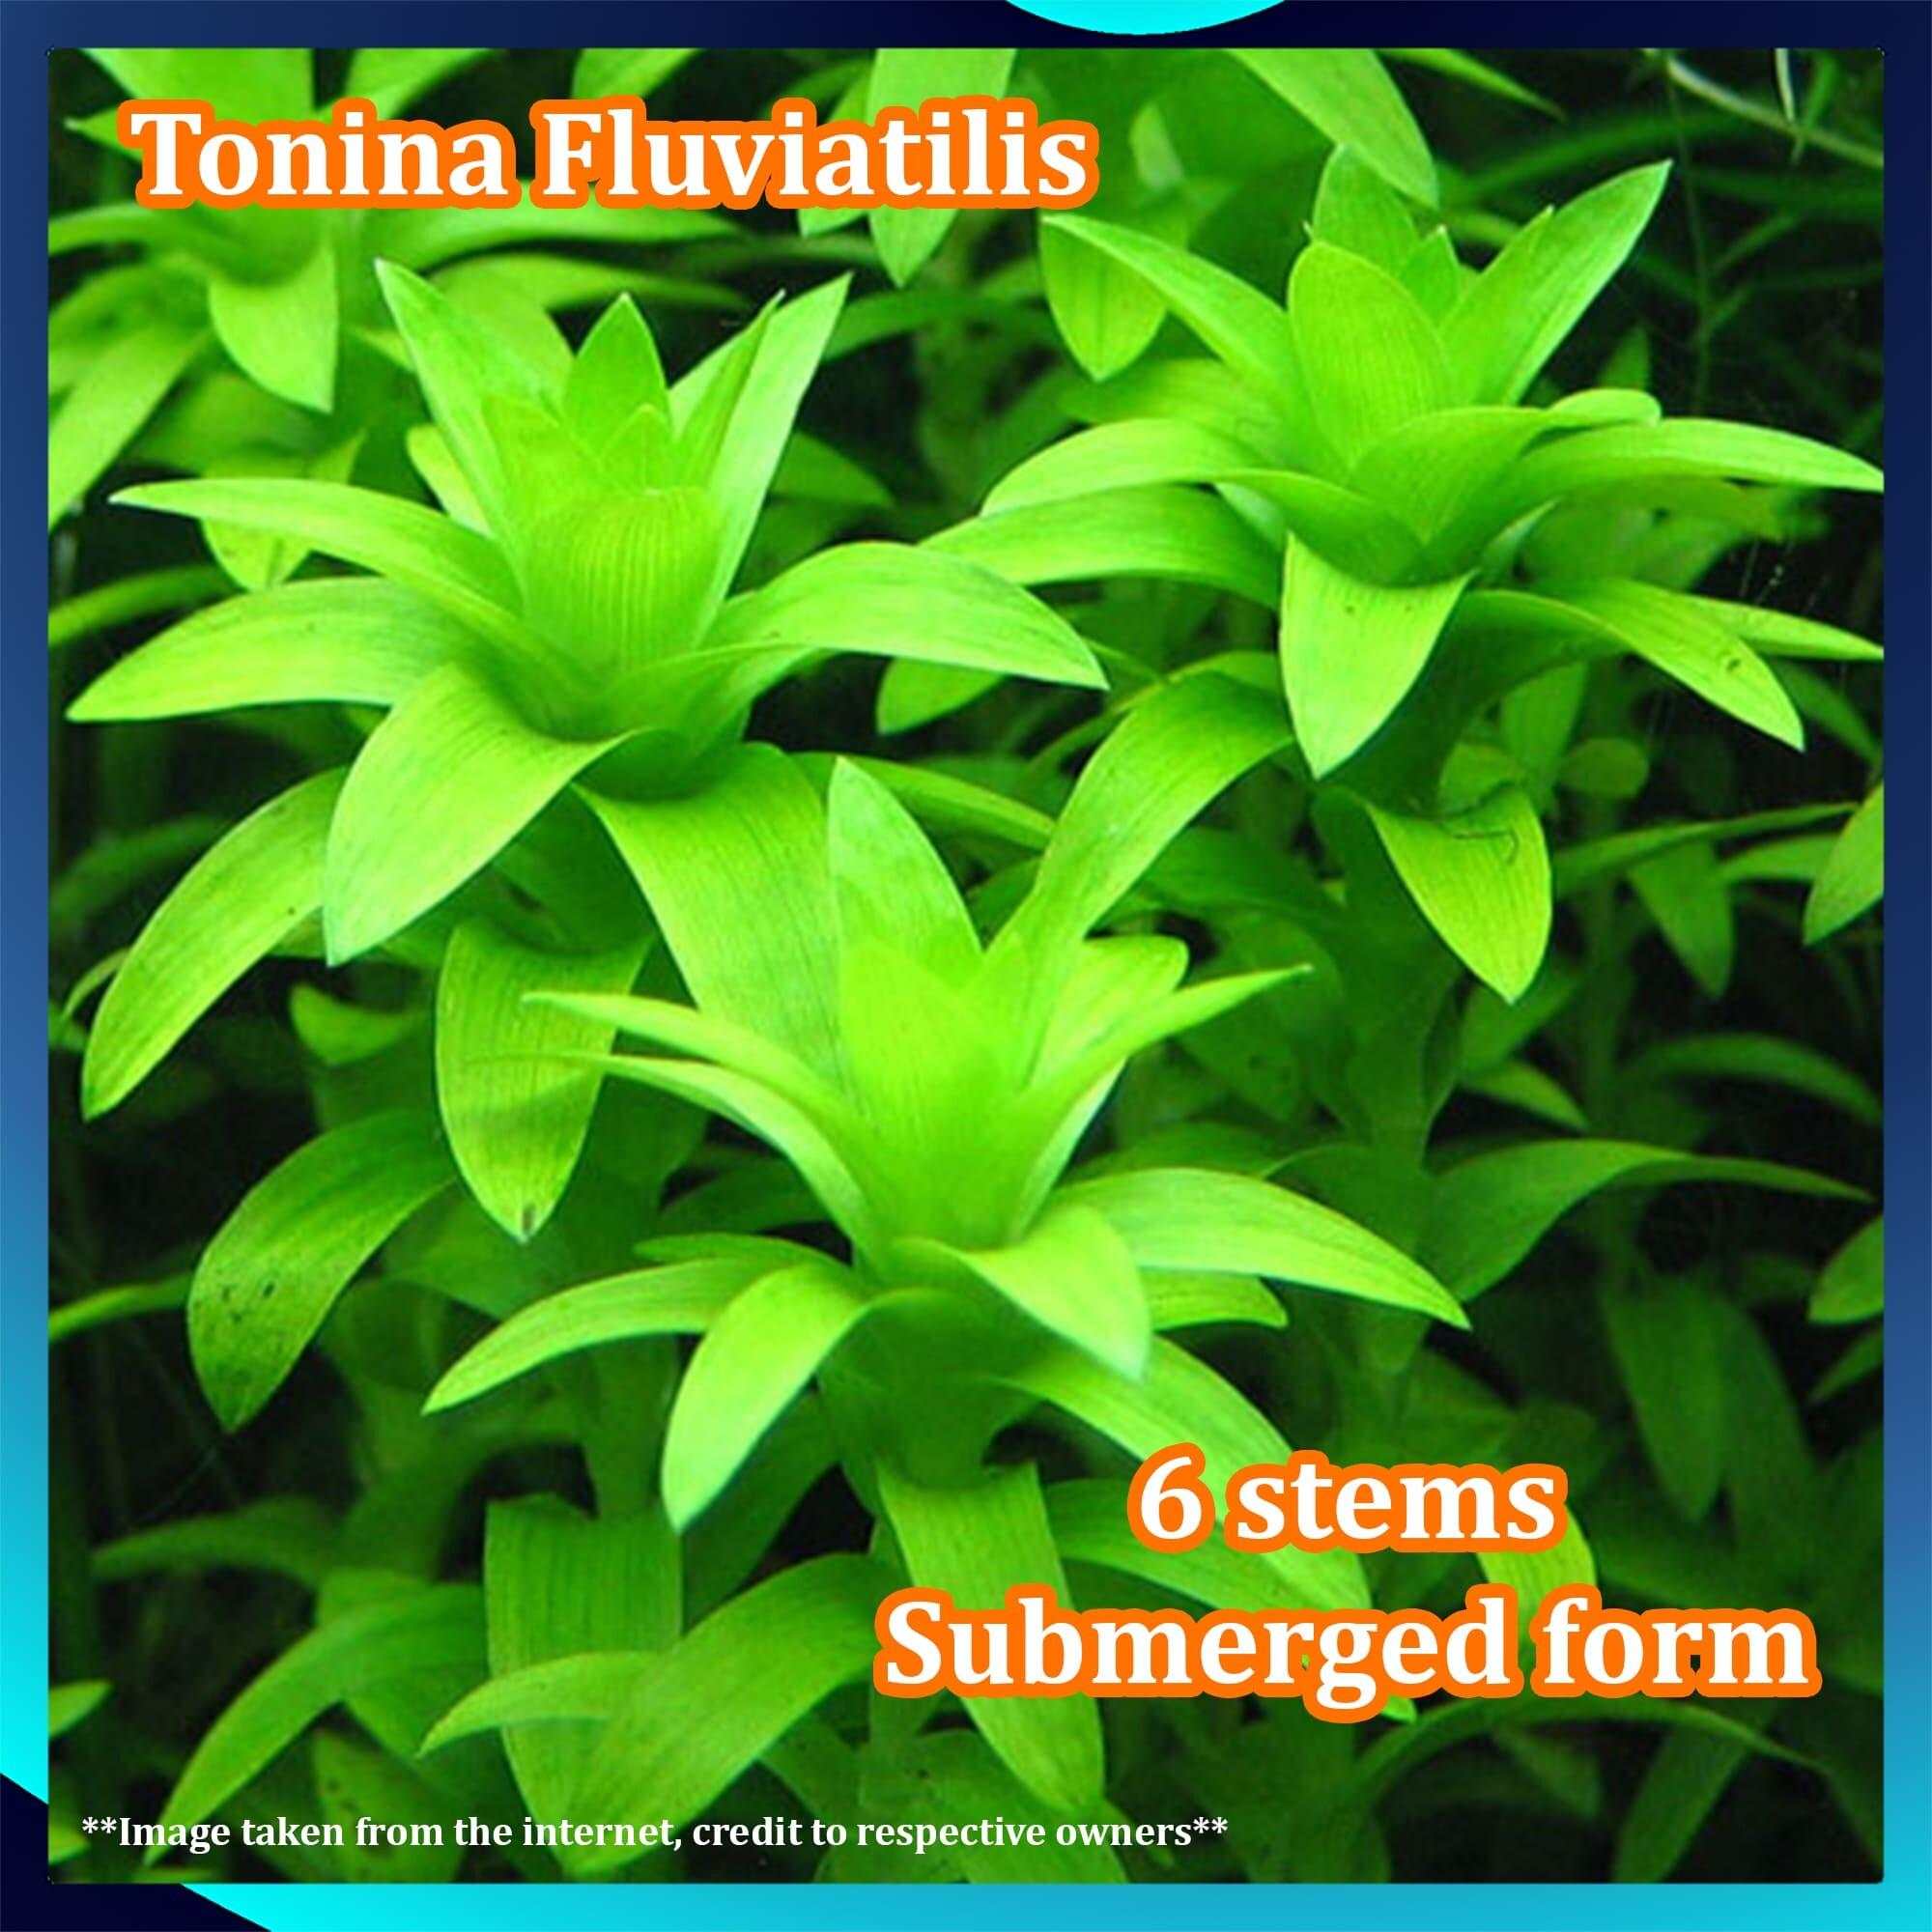 Tonina Fluviatilis LP Aquatic Plant Submerged Form - 6 Stems